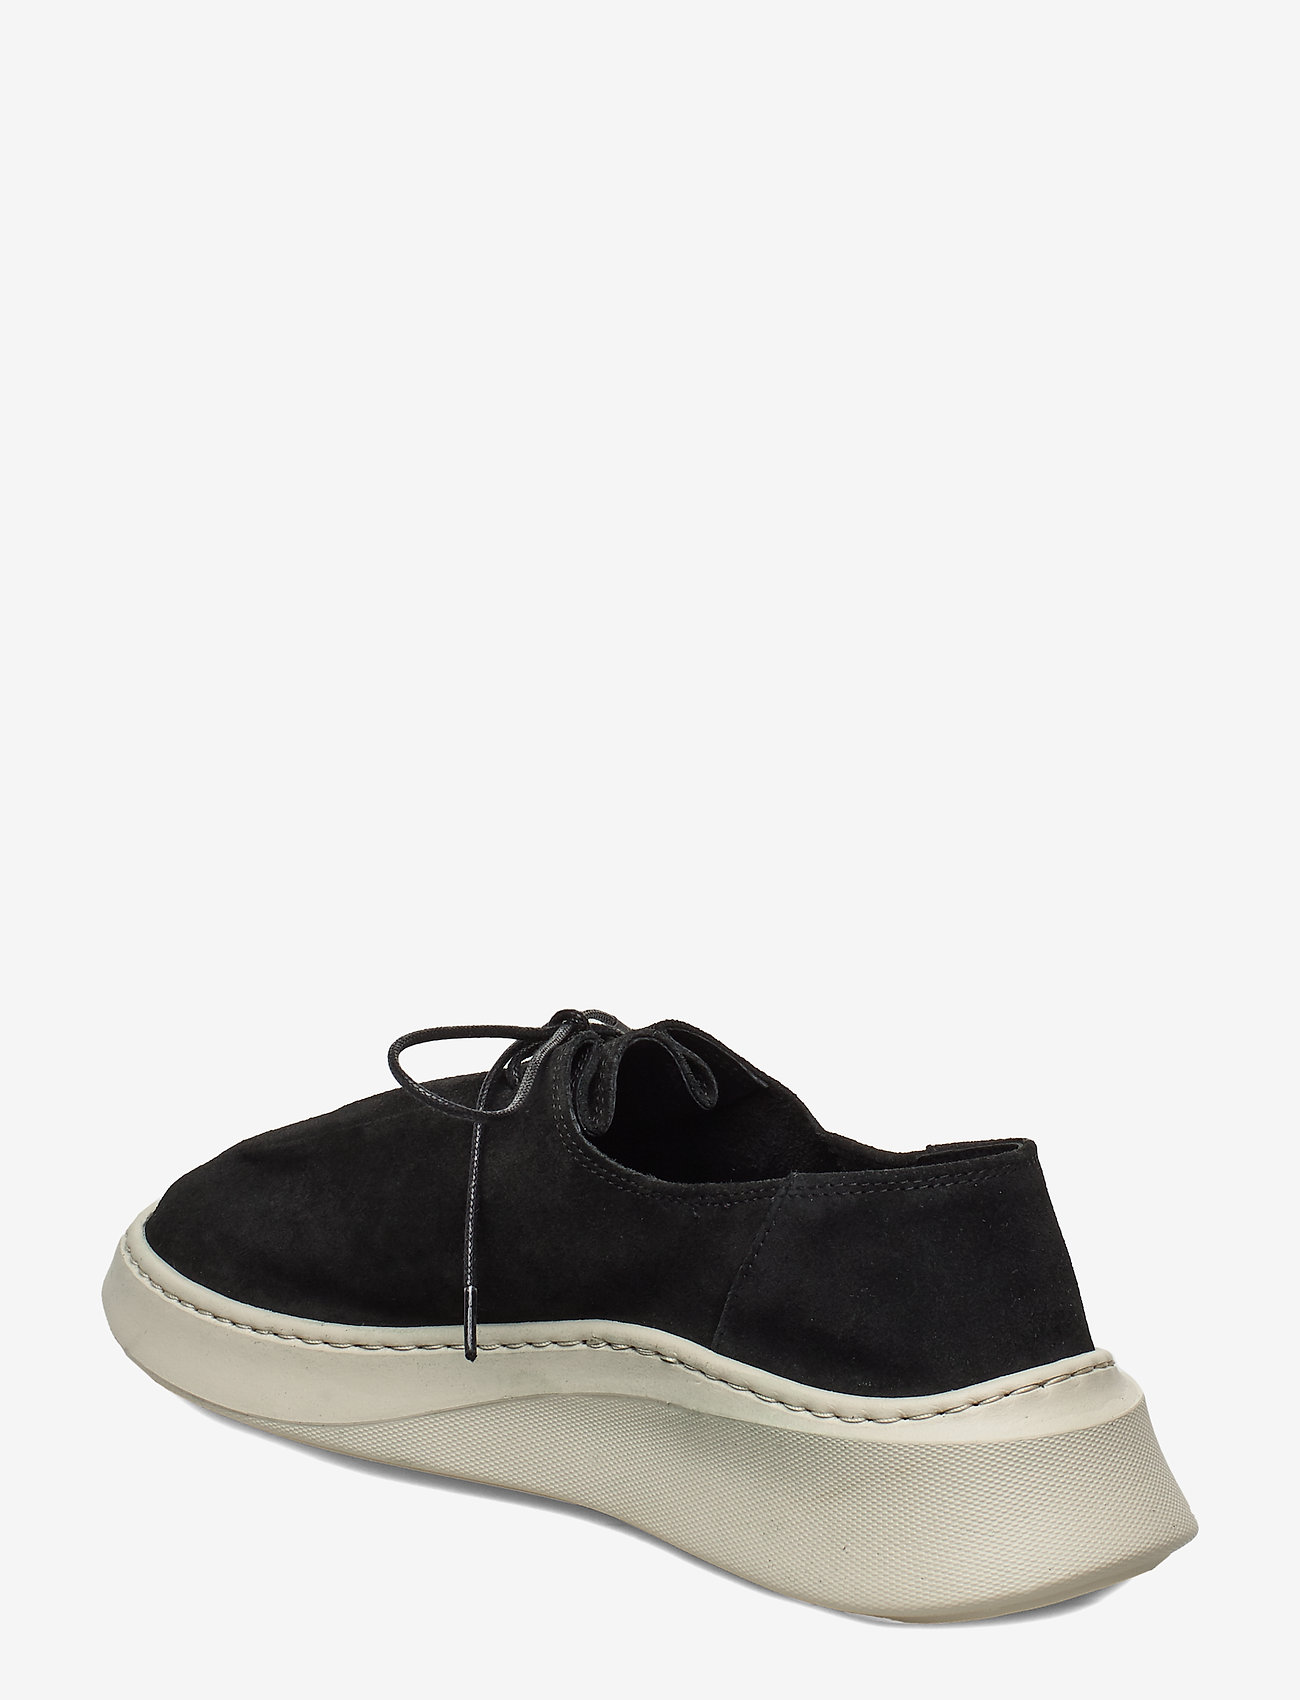 Yatfai Sneaker Black Suede (Black) - Gram